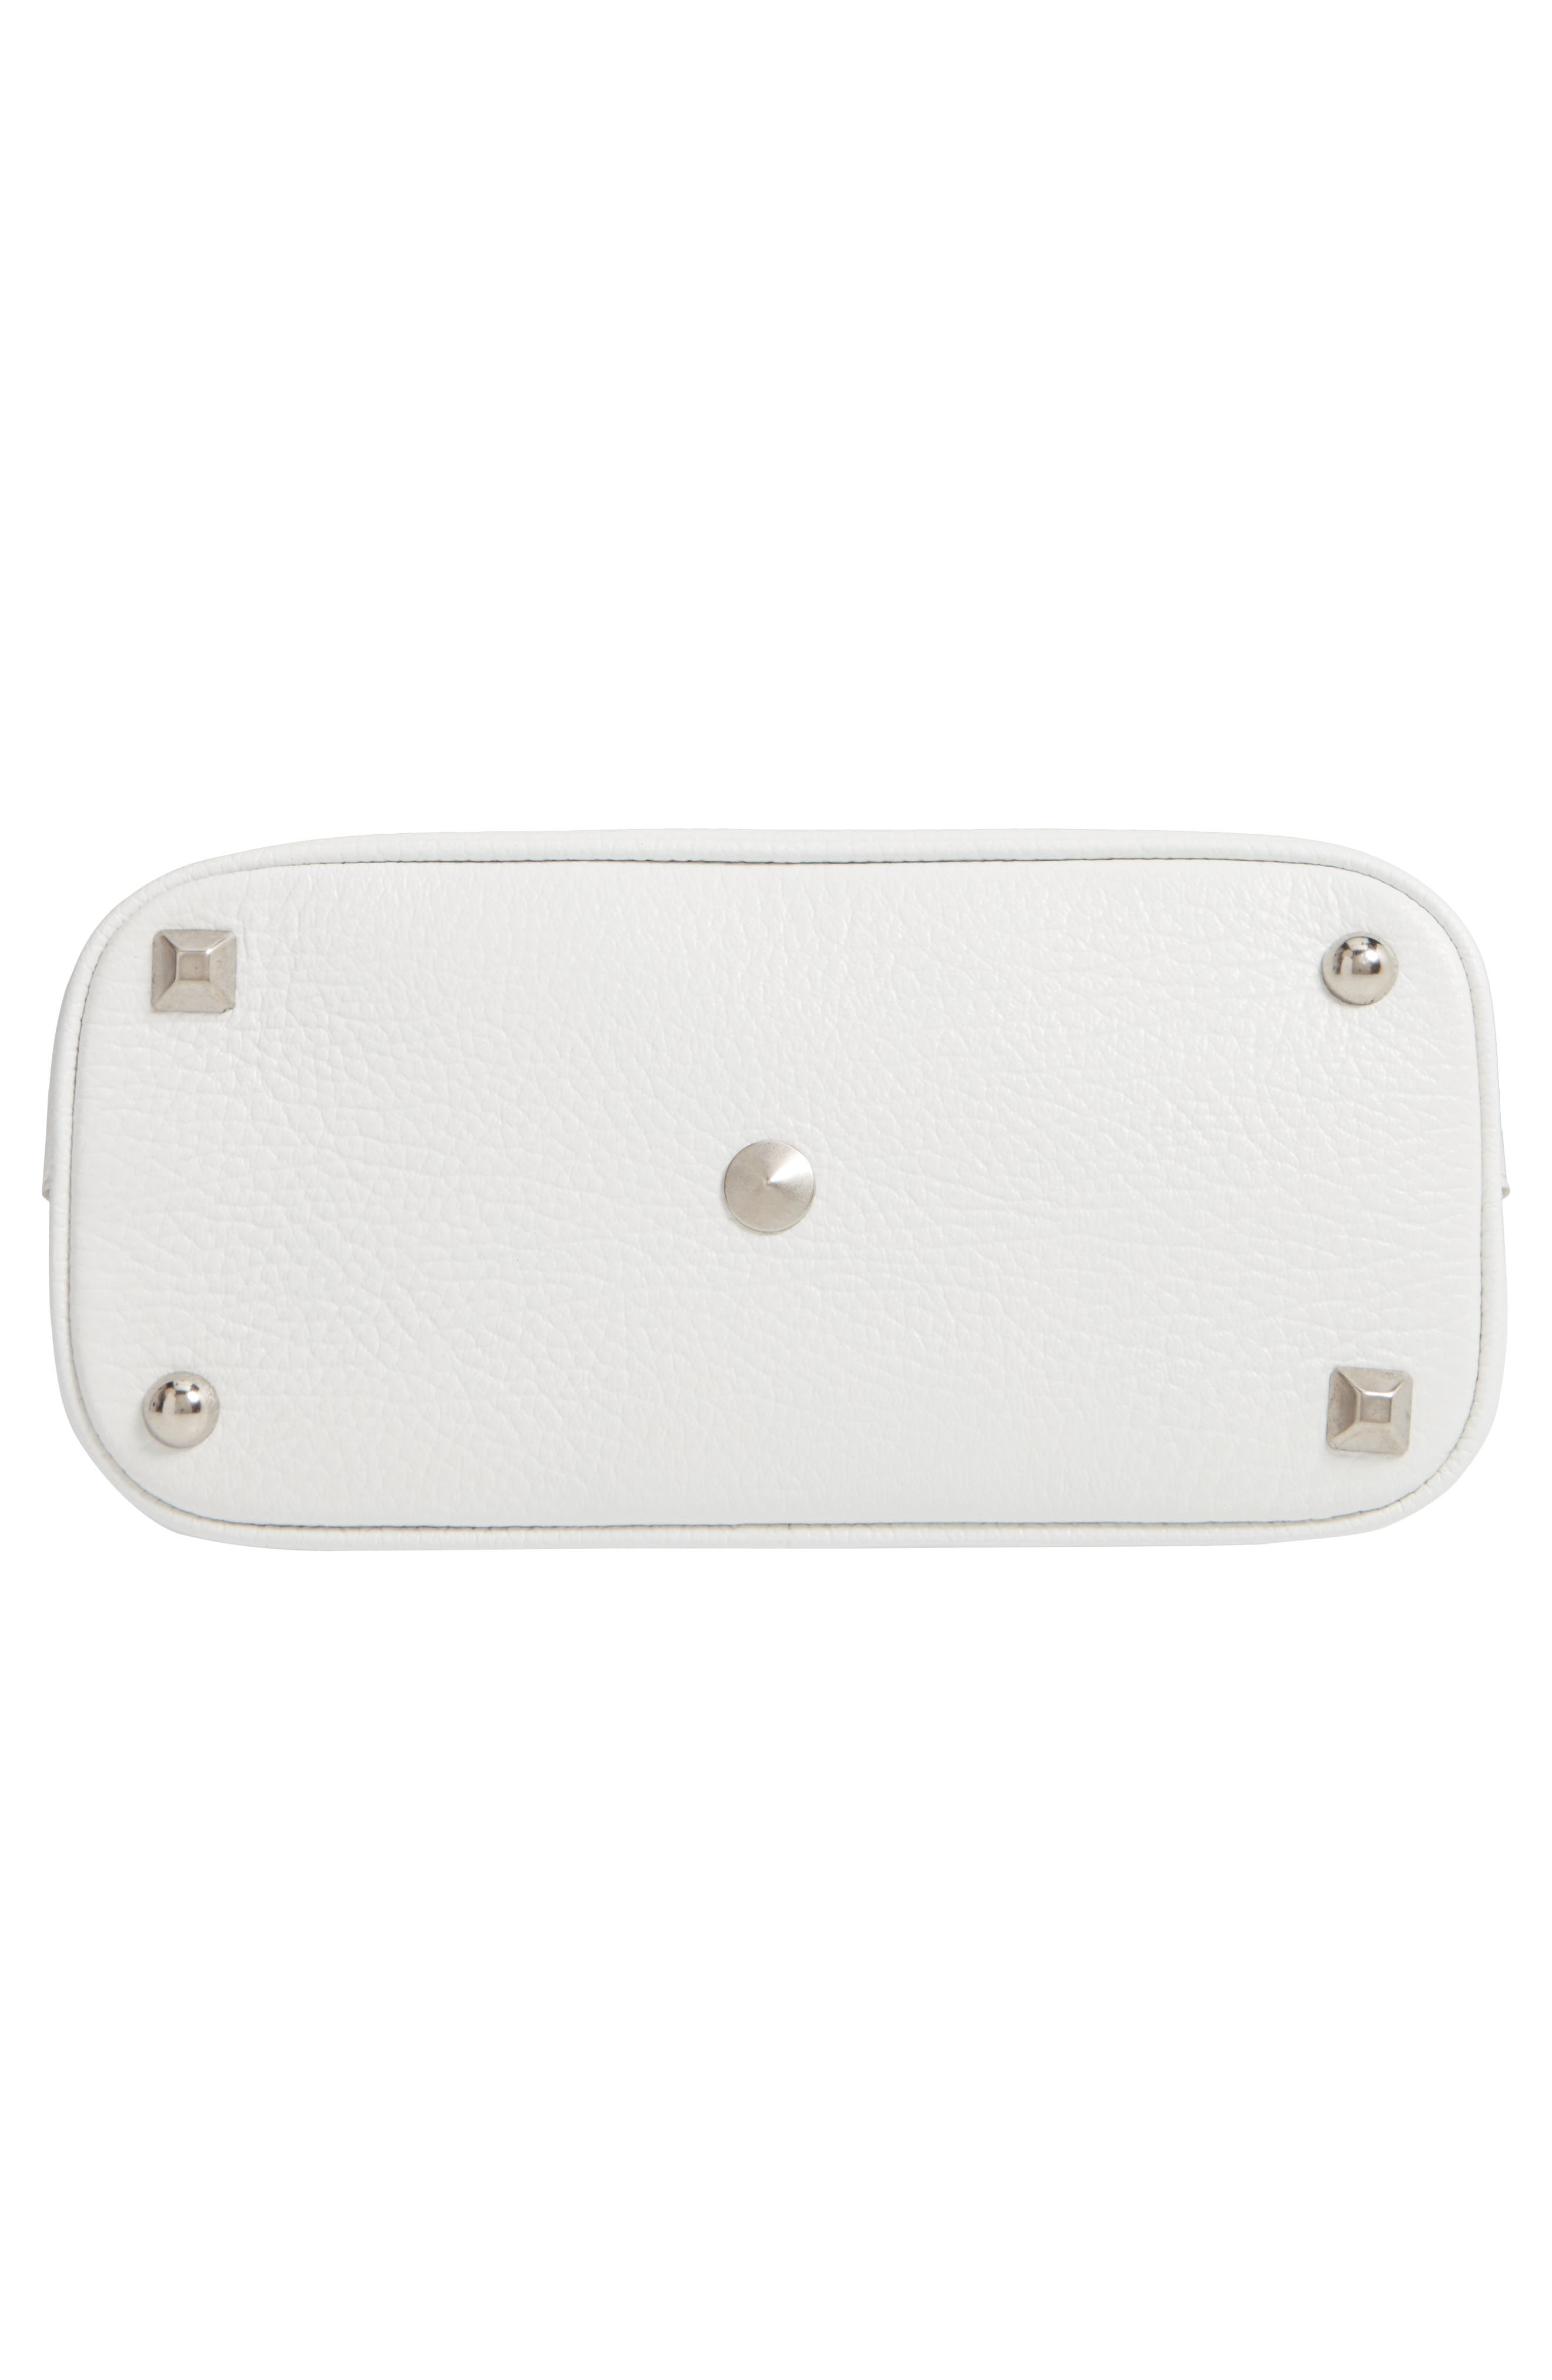 Small 5AC Calfskin Leather Handbag,                             Alternate thumbnail 7, color,                             WHITE